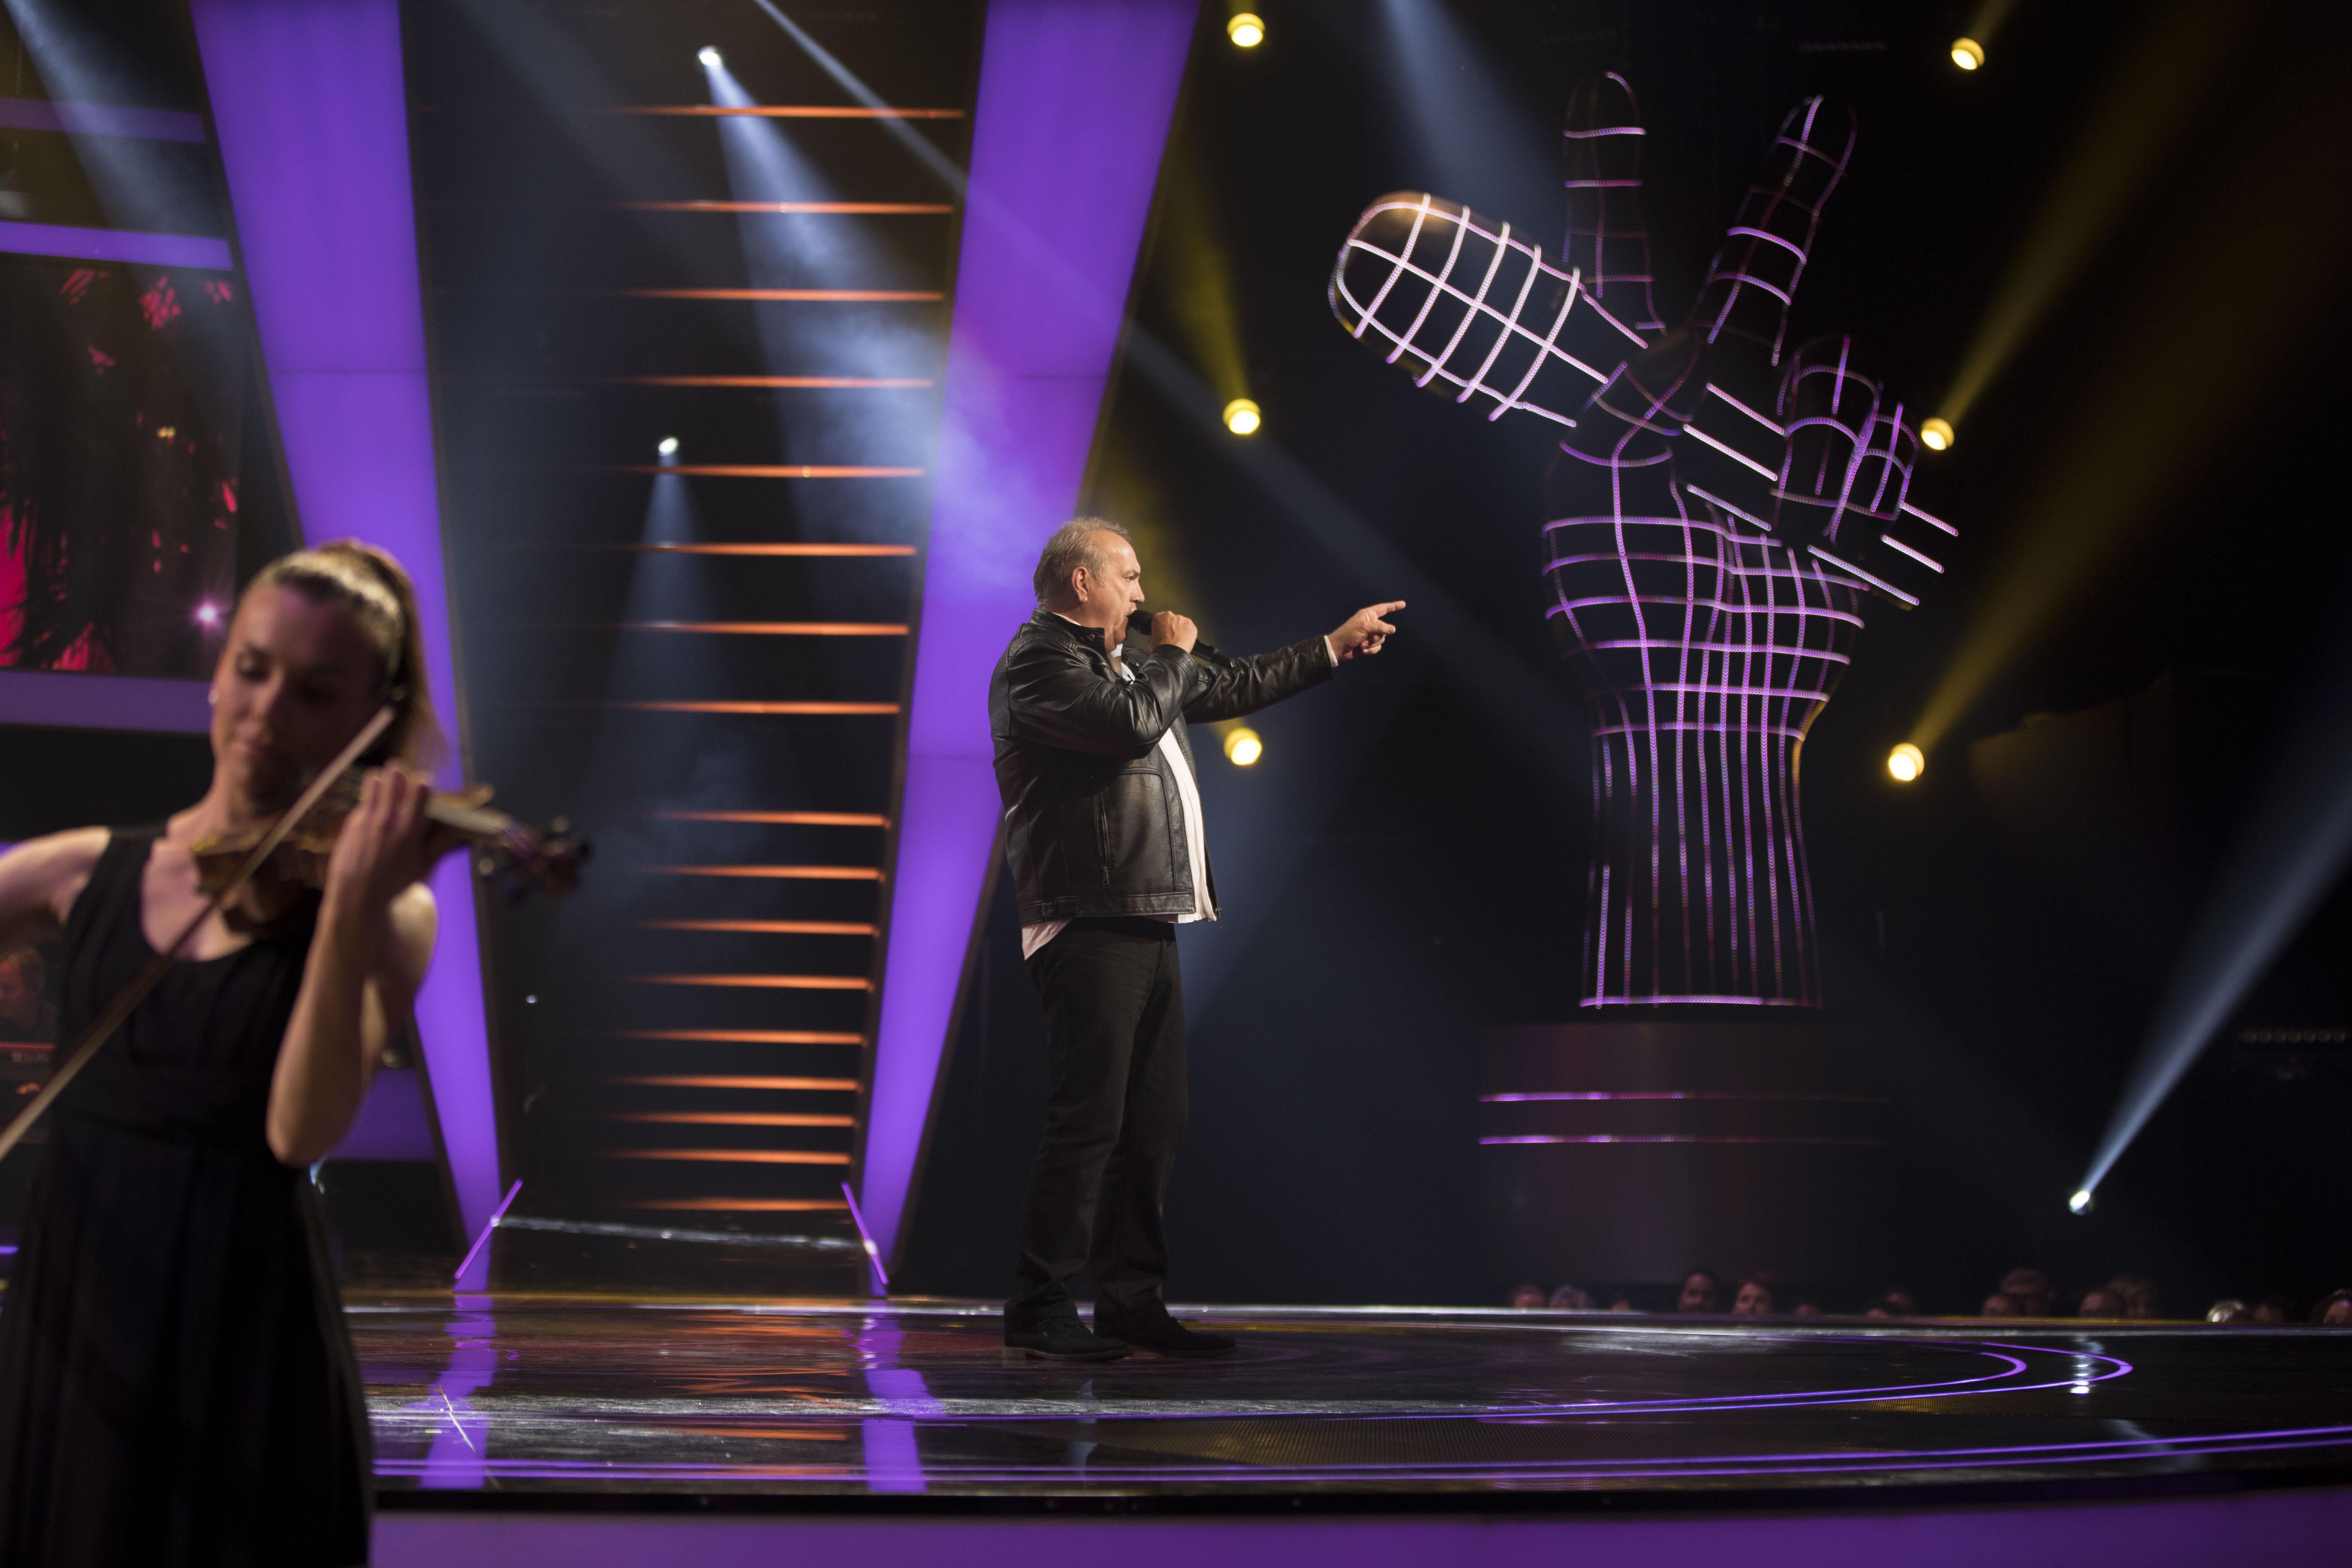 Georges Lotze zingt vrijdagavond opnieuw een nummer van Neil Diamond. (Foto: RTL) rodi.nl © rodi